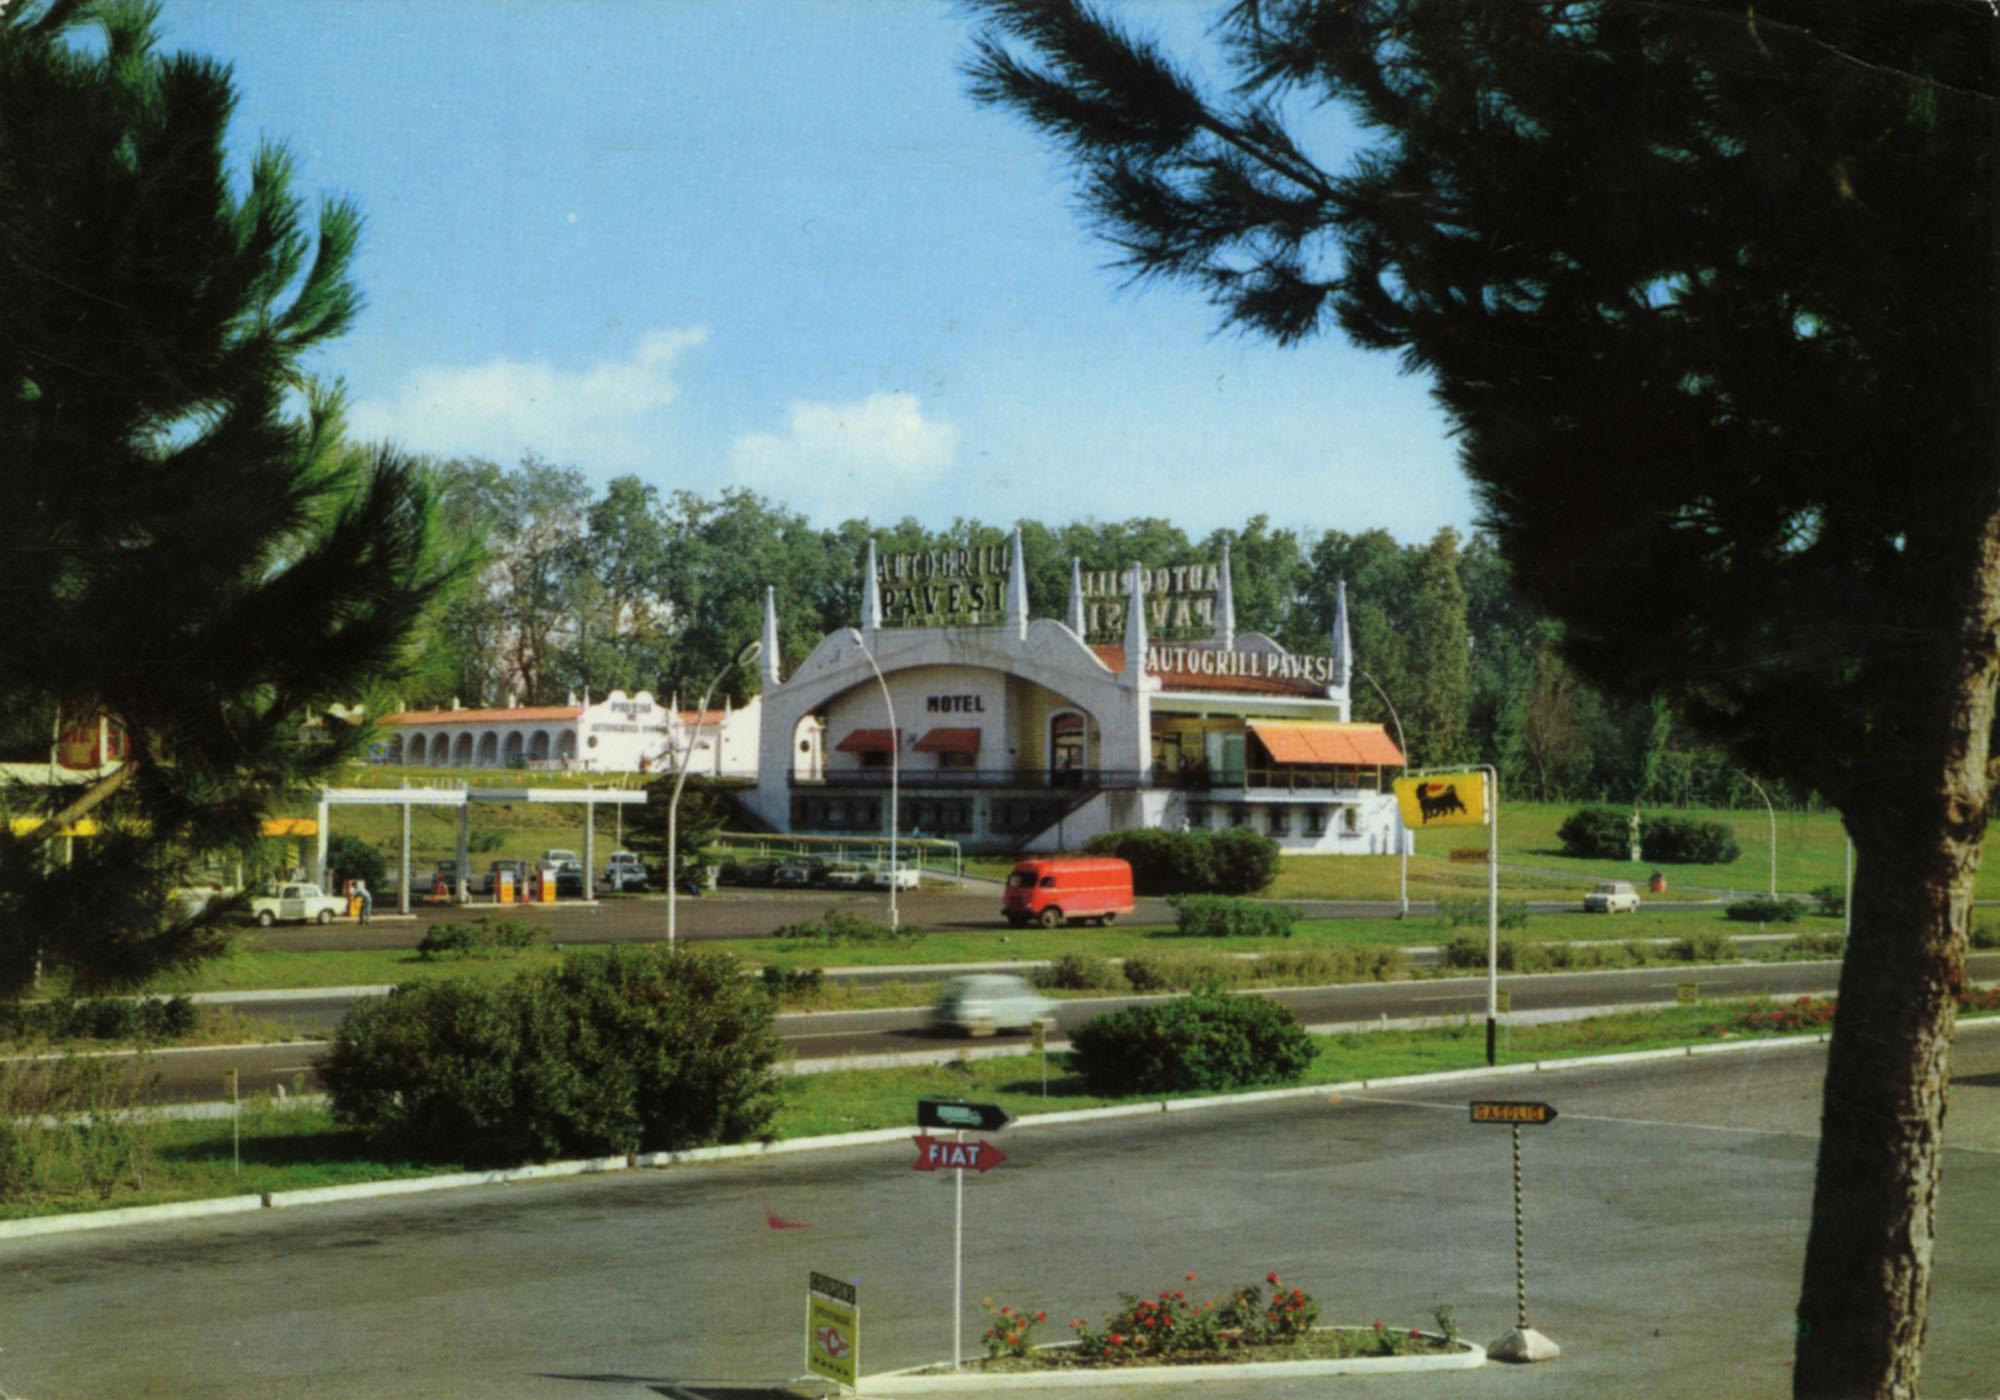 Pavesi Service Station postcard - San Nicola - Caserta